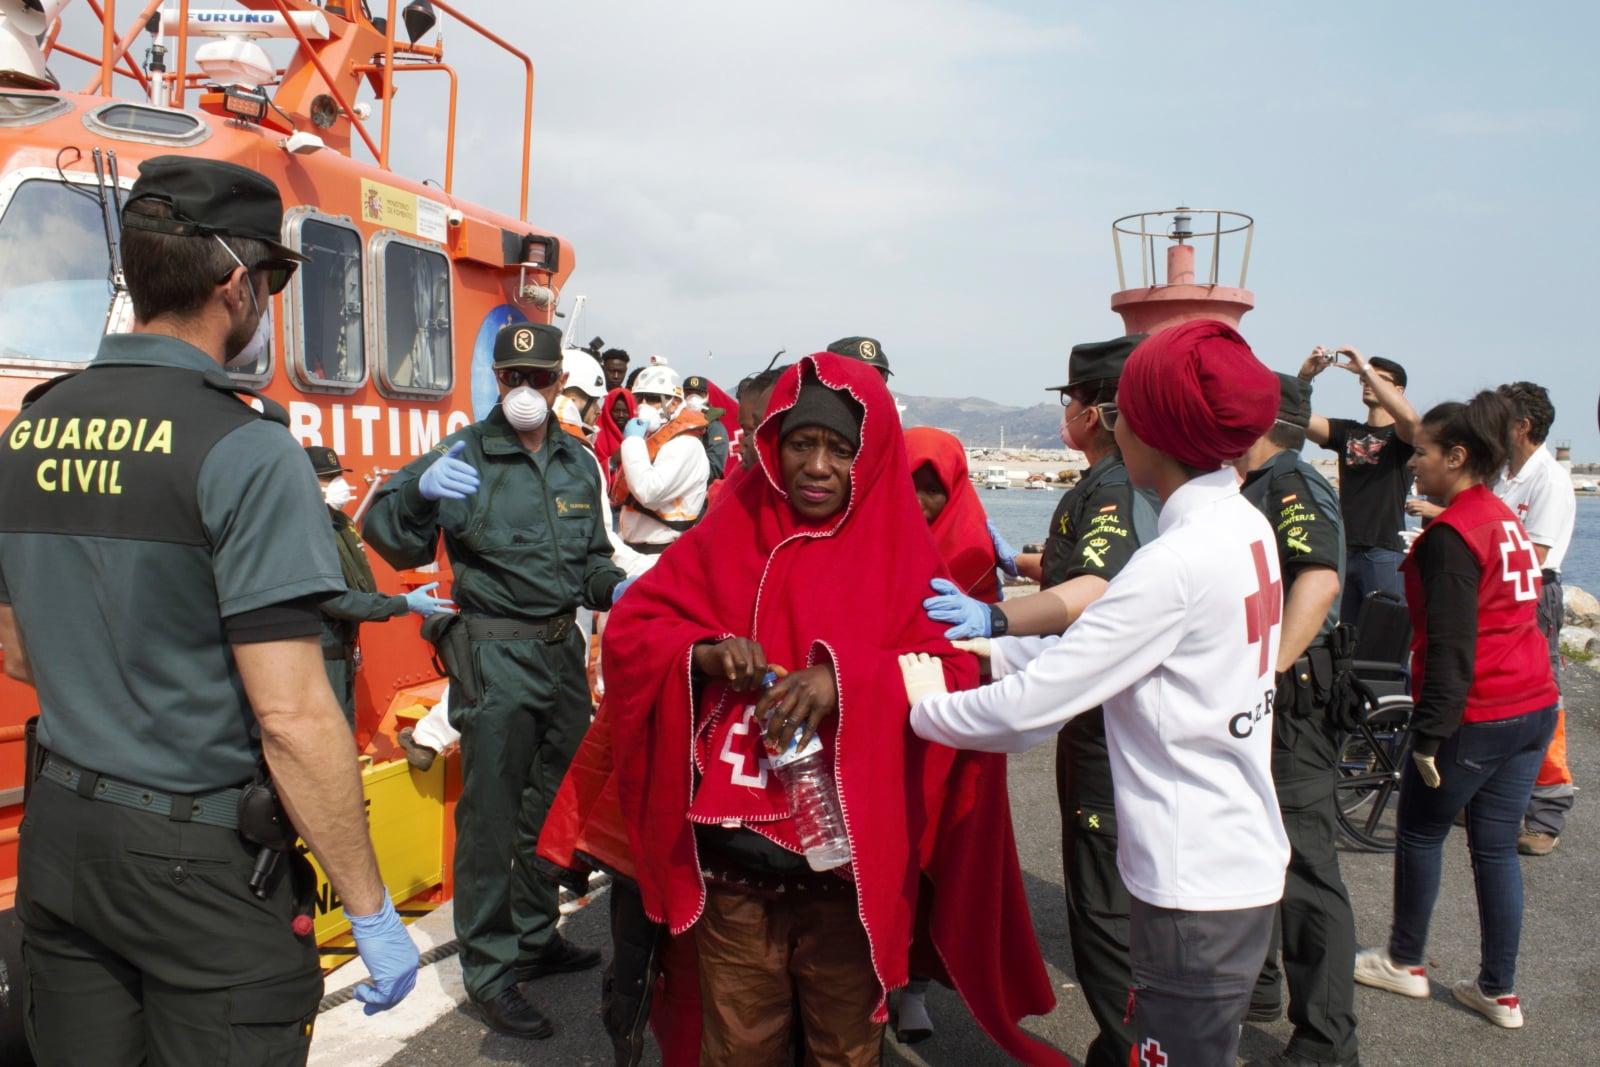 Migranci w Hiszpanii fot. EPA/Alba Feixas